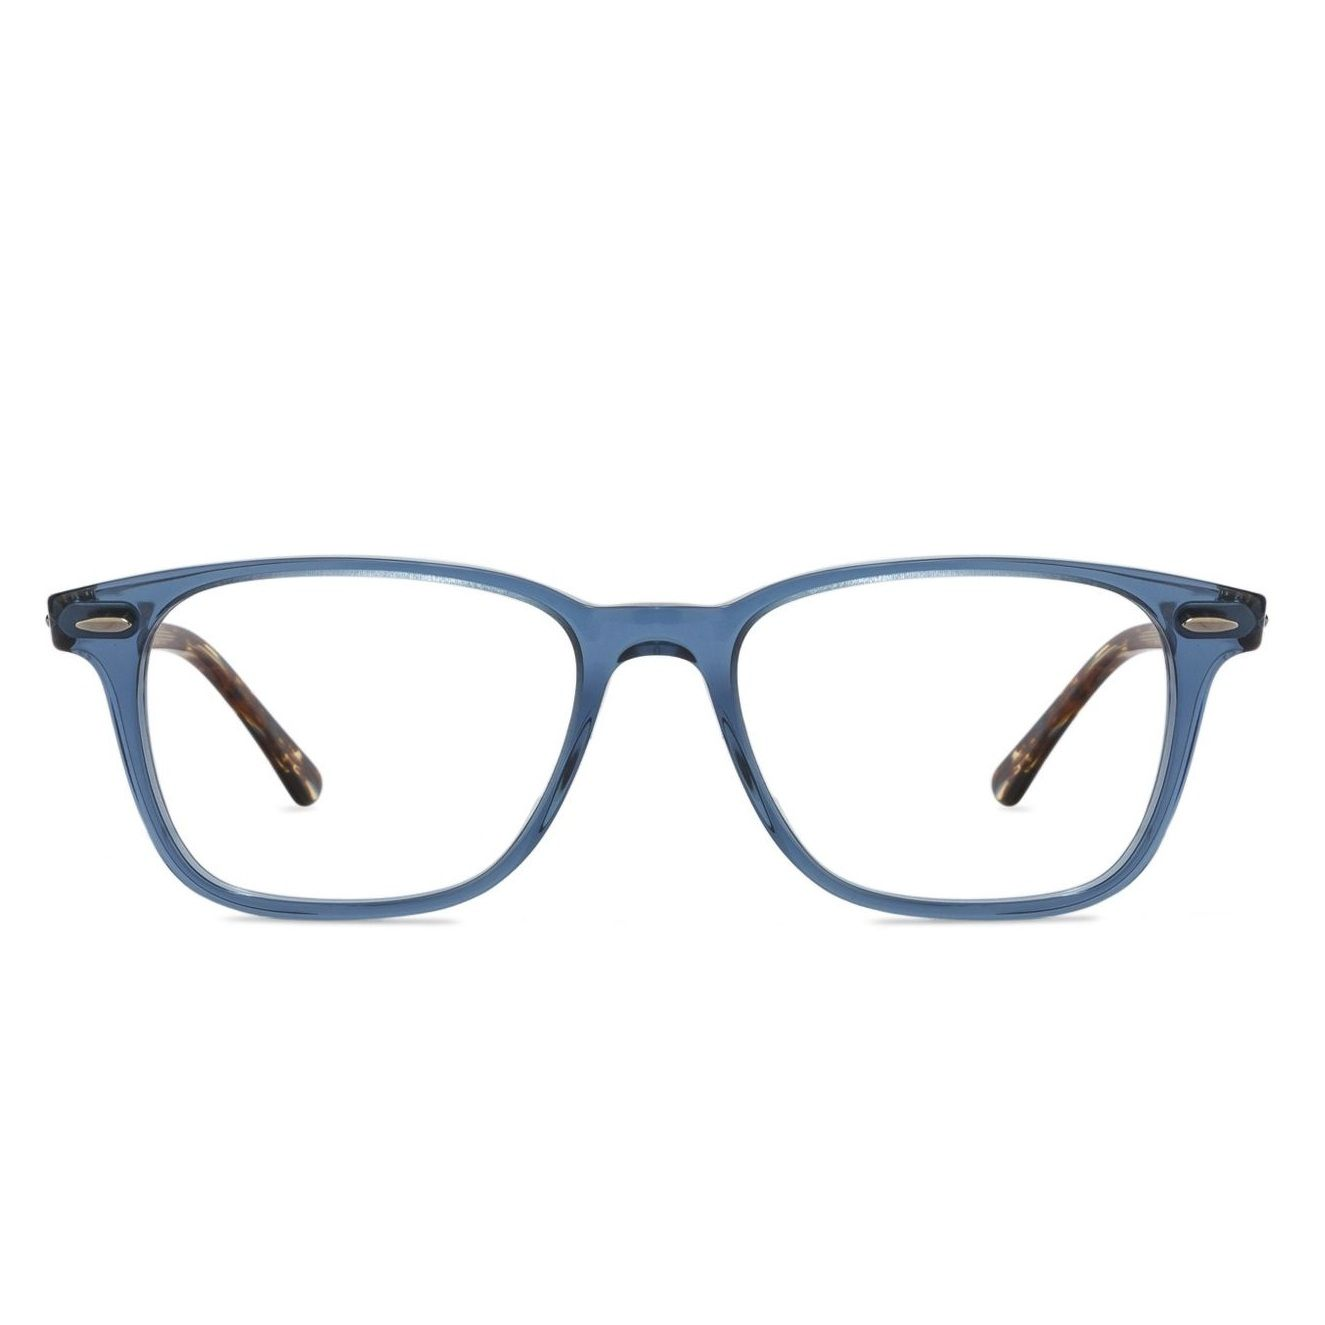 dbbaa239c52 Ray-Ban RX7119-8024 Blue Transparent Frame With Tortoise Temple Unisex  Wayfarer Eyeglasses  RayBan  Eyeglasses  LatestEyeglasses  BestPrice   Onlineshopping ...